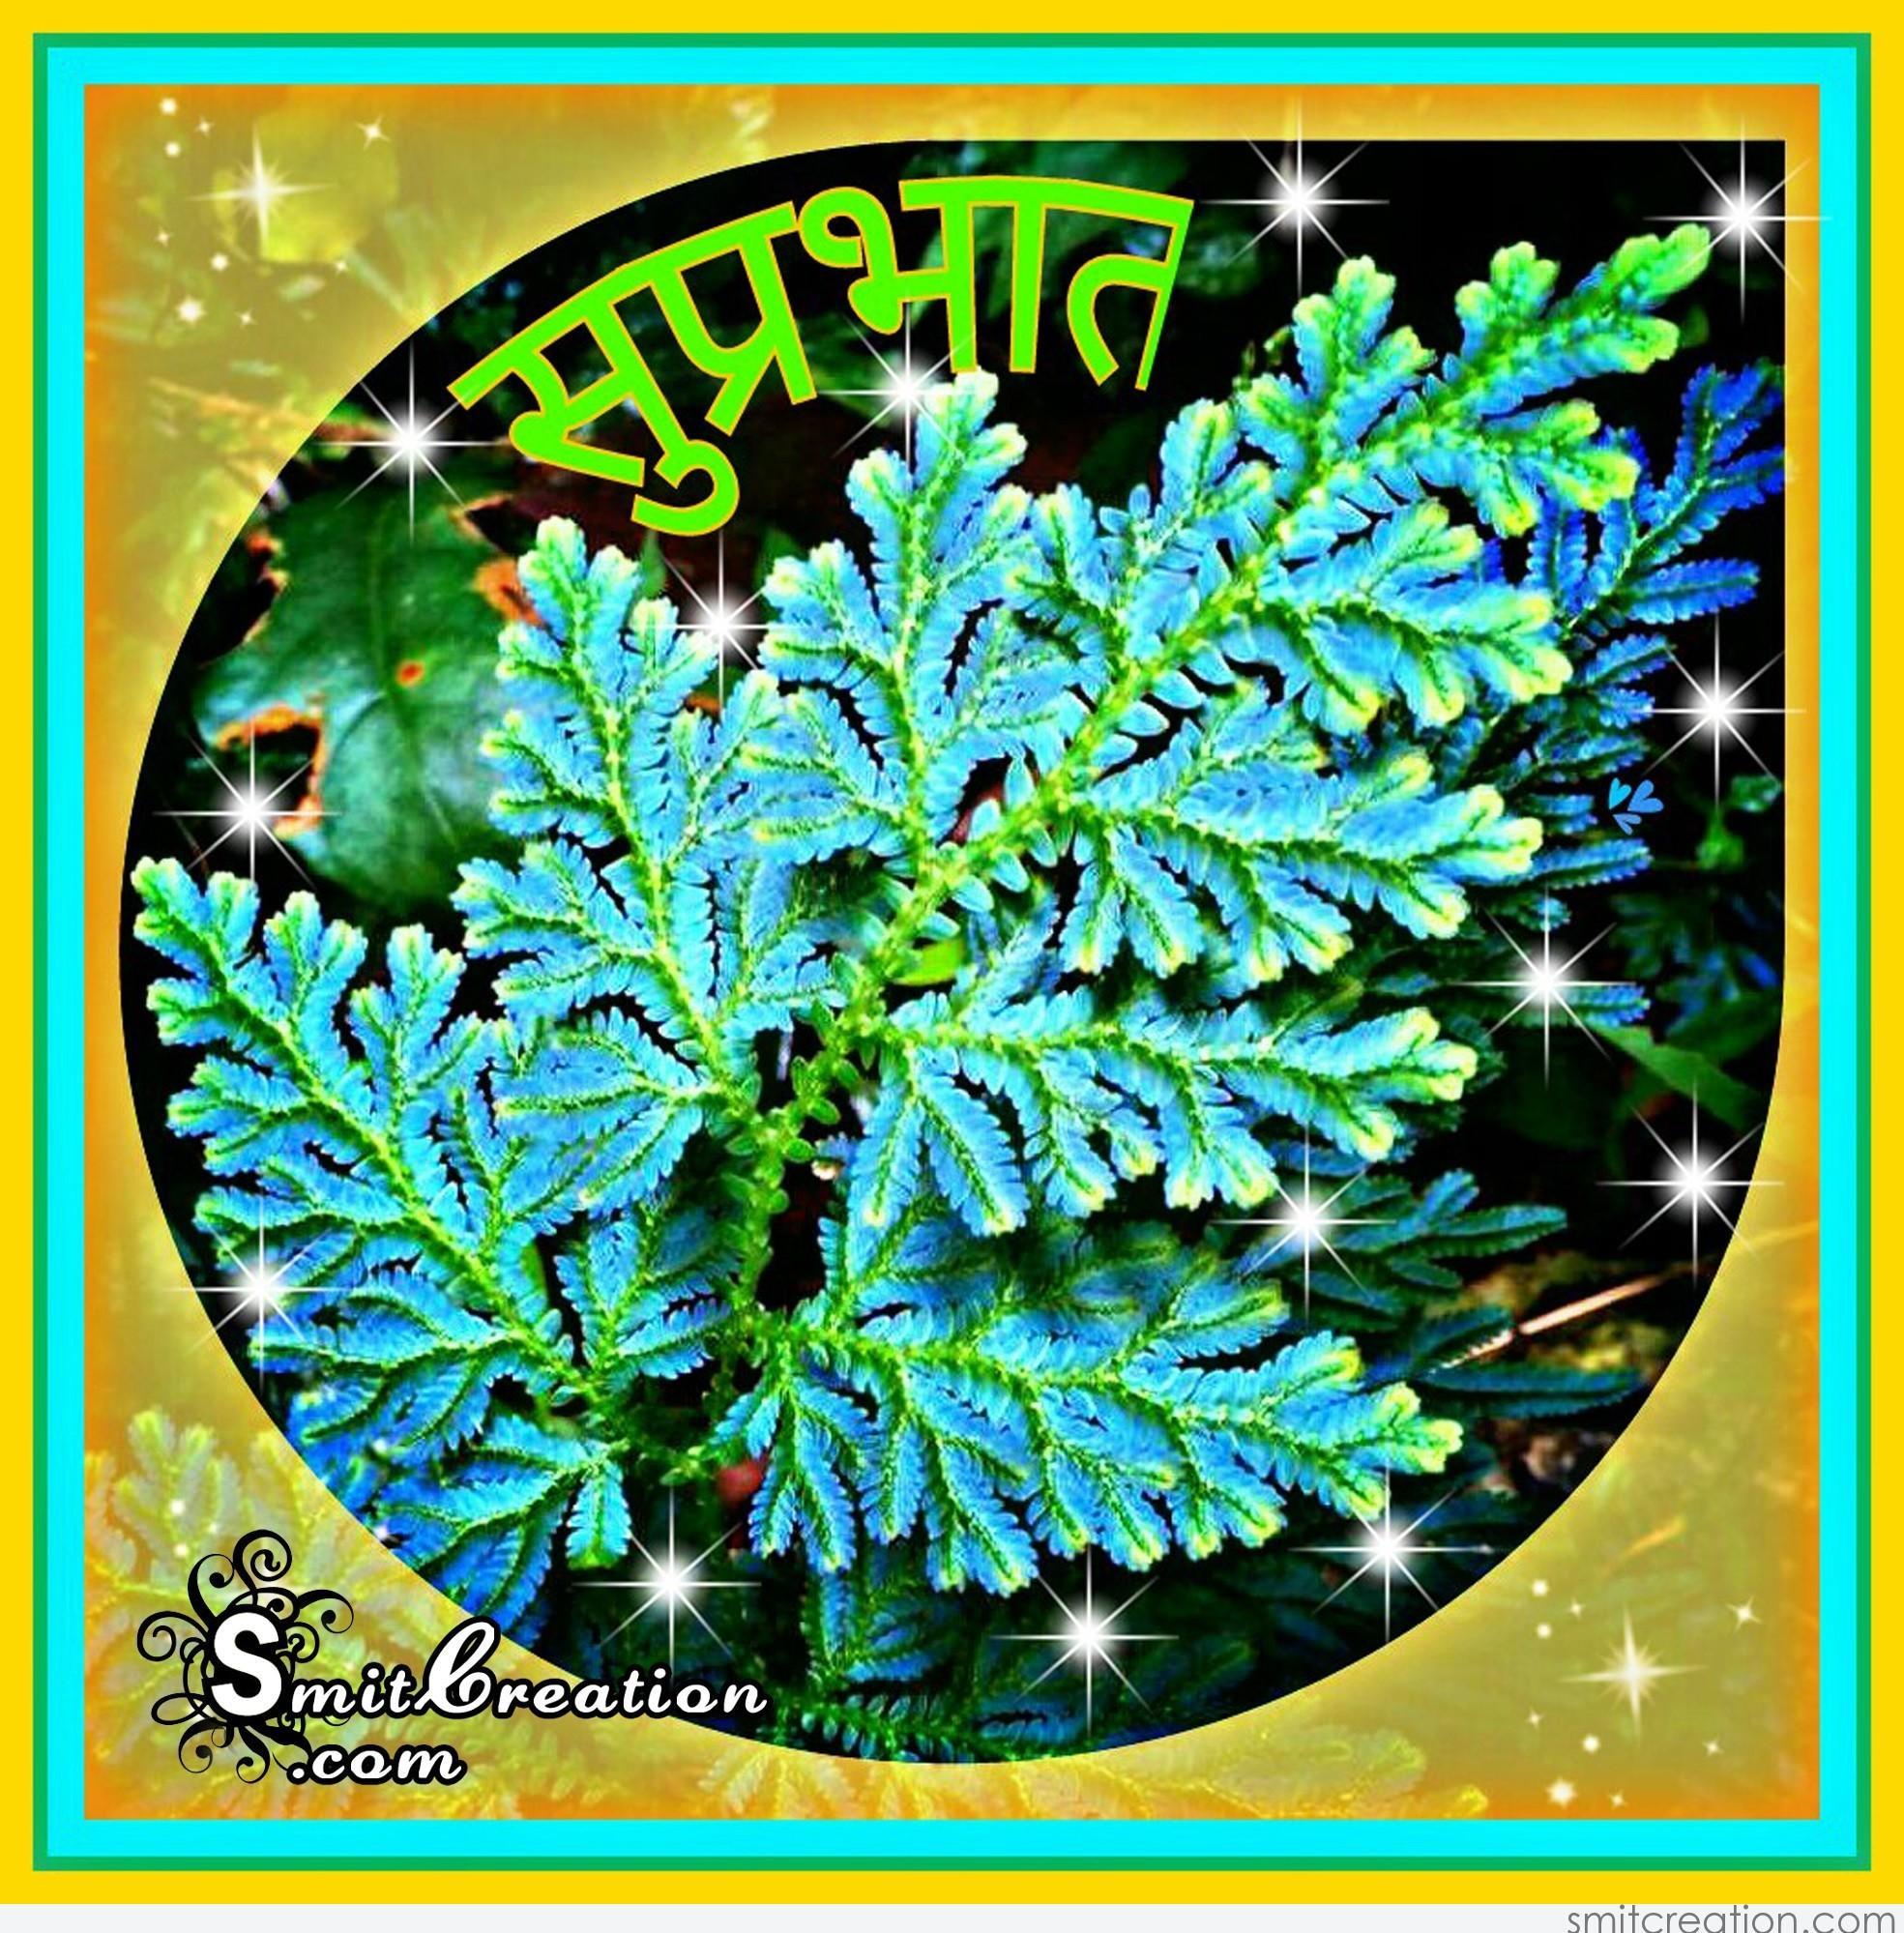 Suprabhat best image in hindi - sdqpt.xdrol.kim